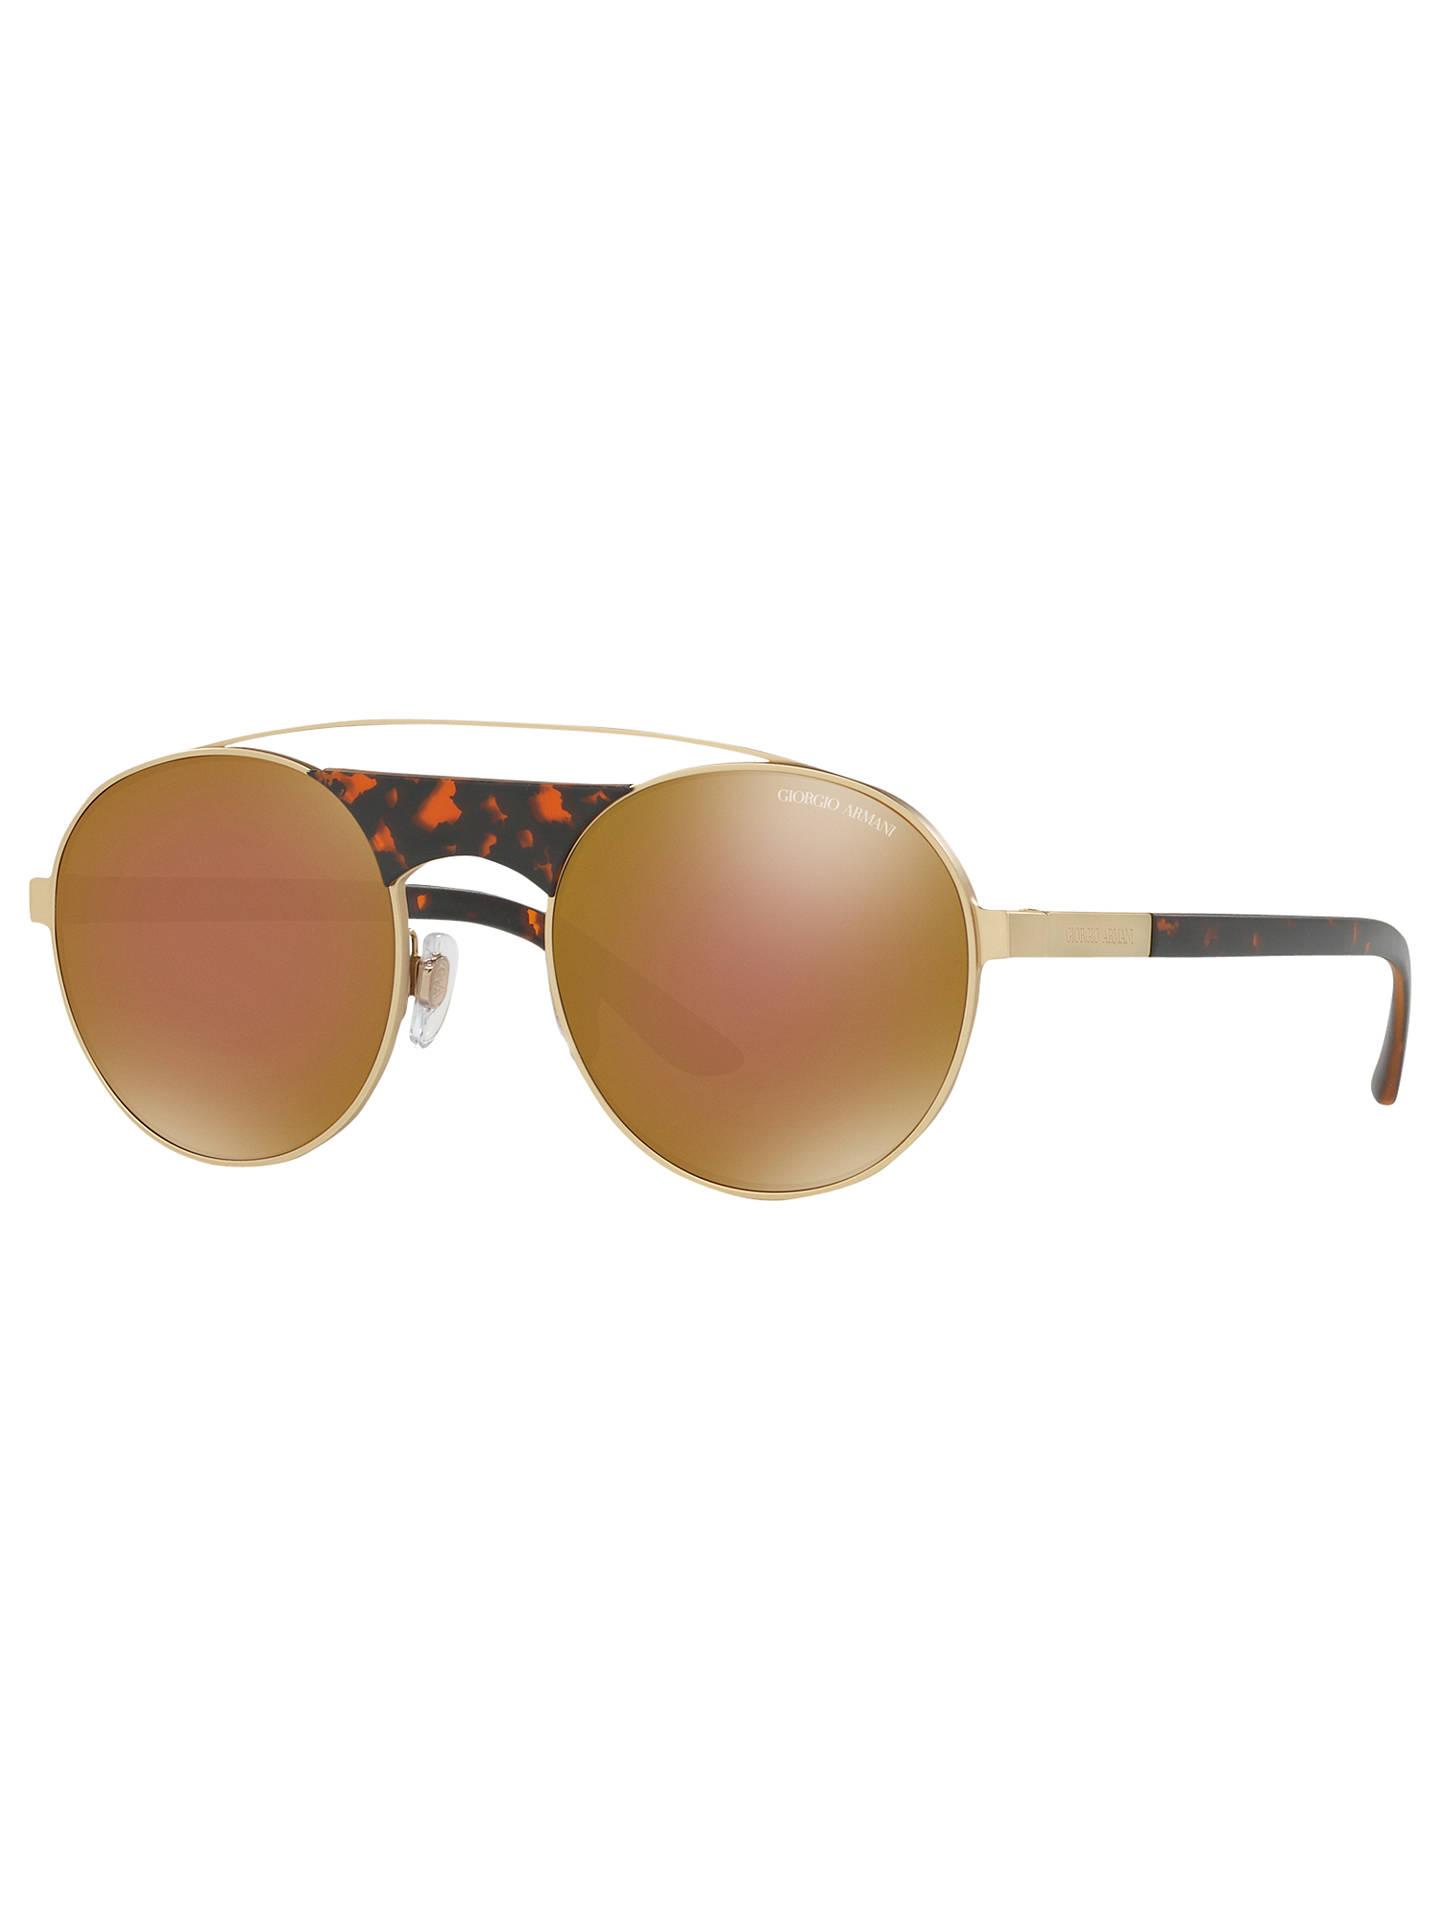 08bc24bacb3 Buy Giorgio Armani AR6047 Round Sunglasses